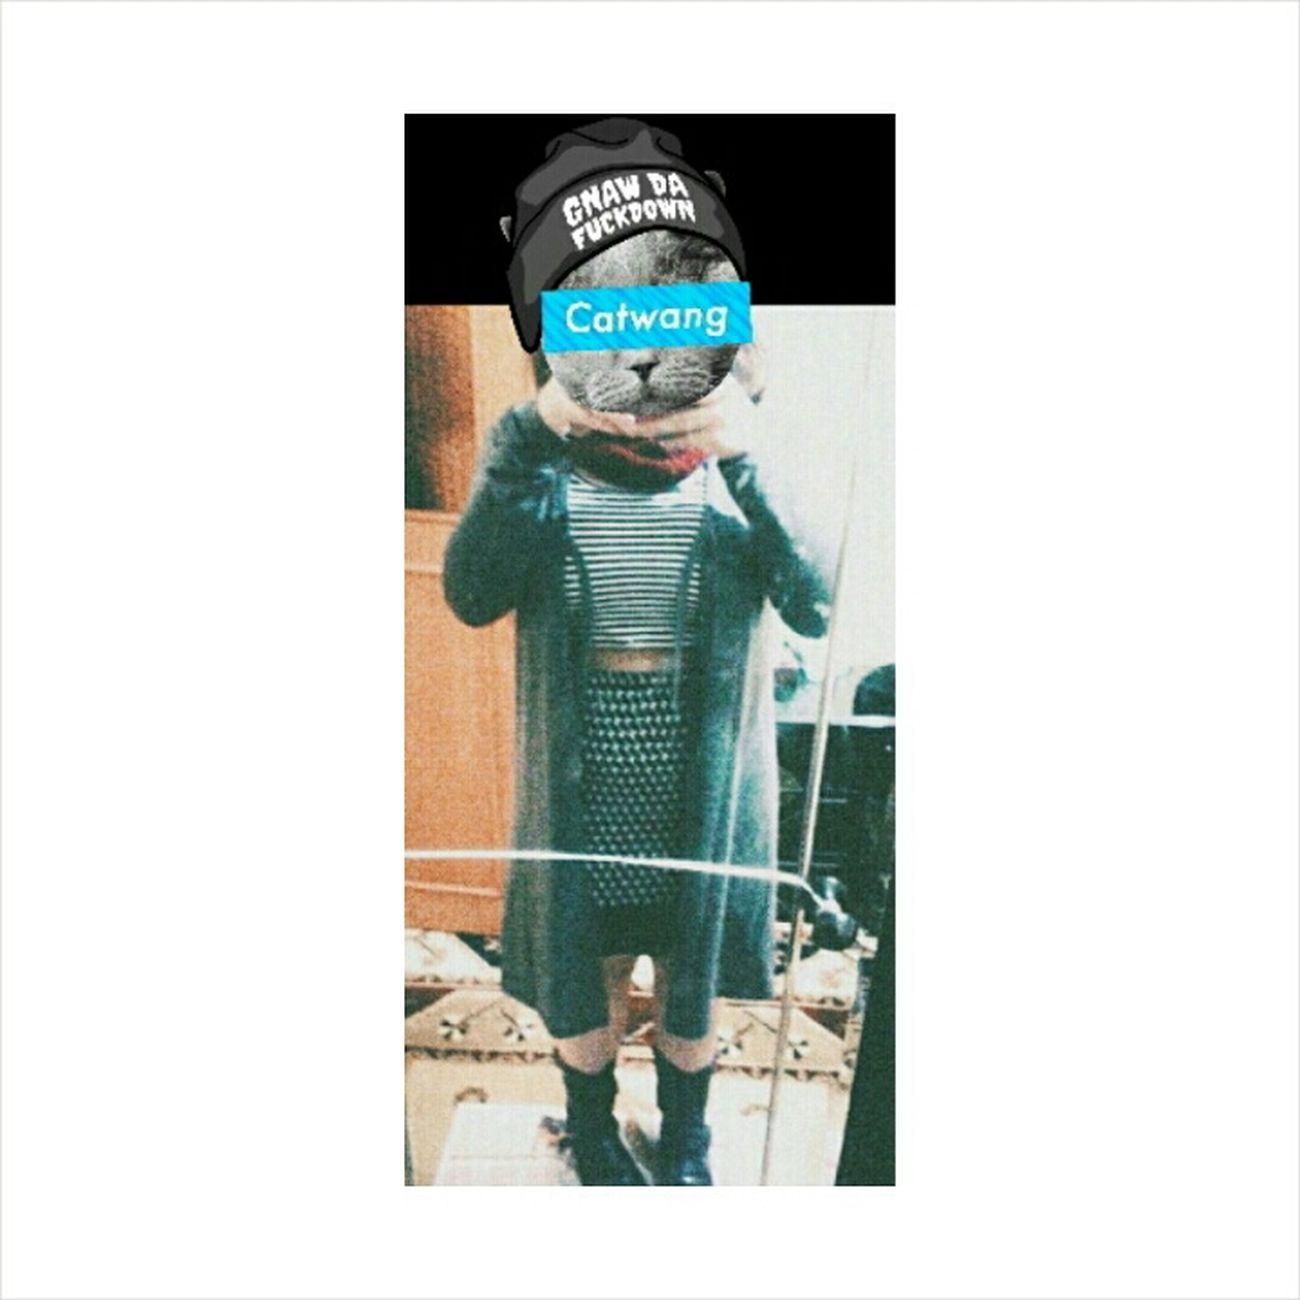 CATWANG Catwang♥ Catwang😺 hahha